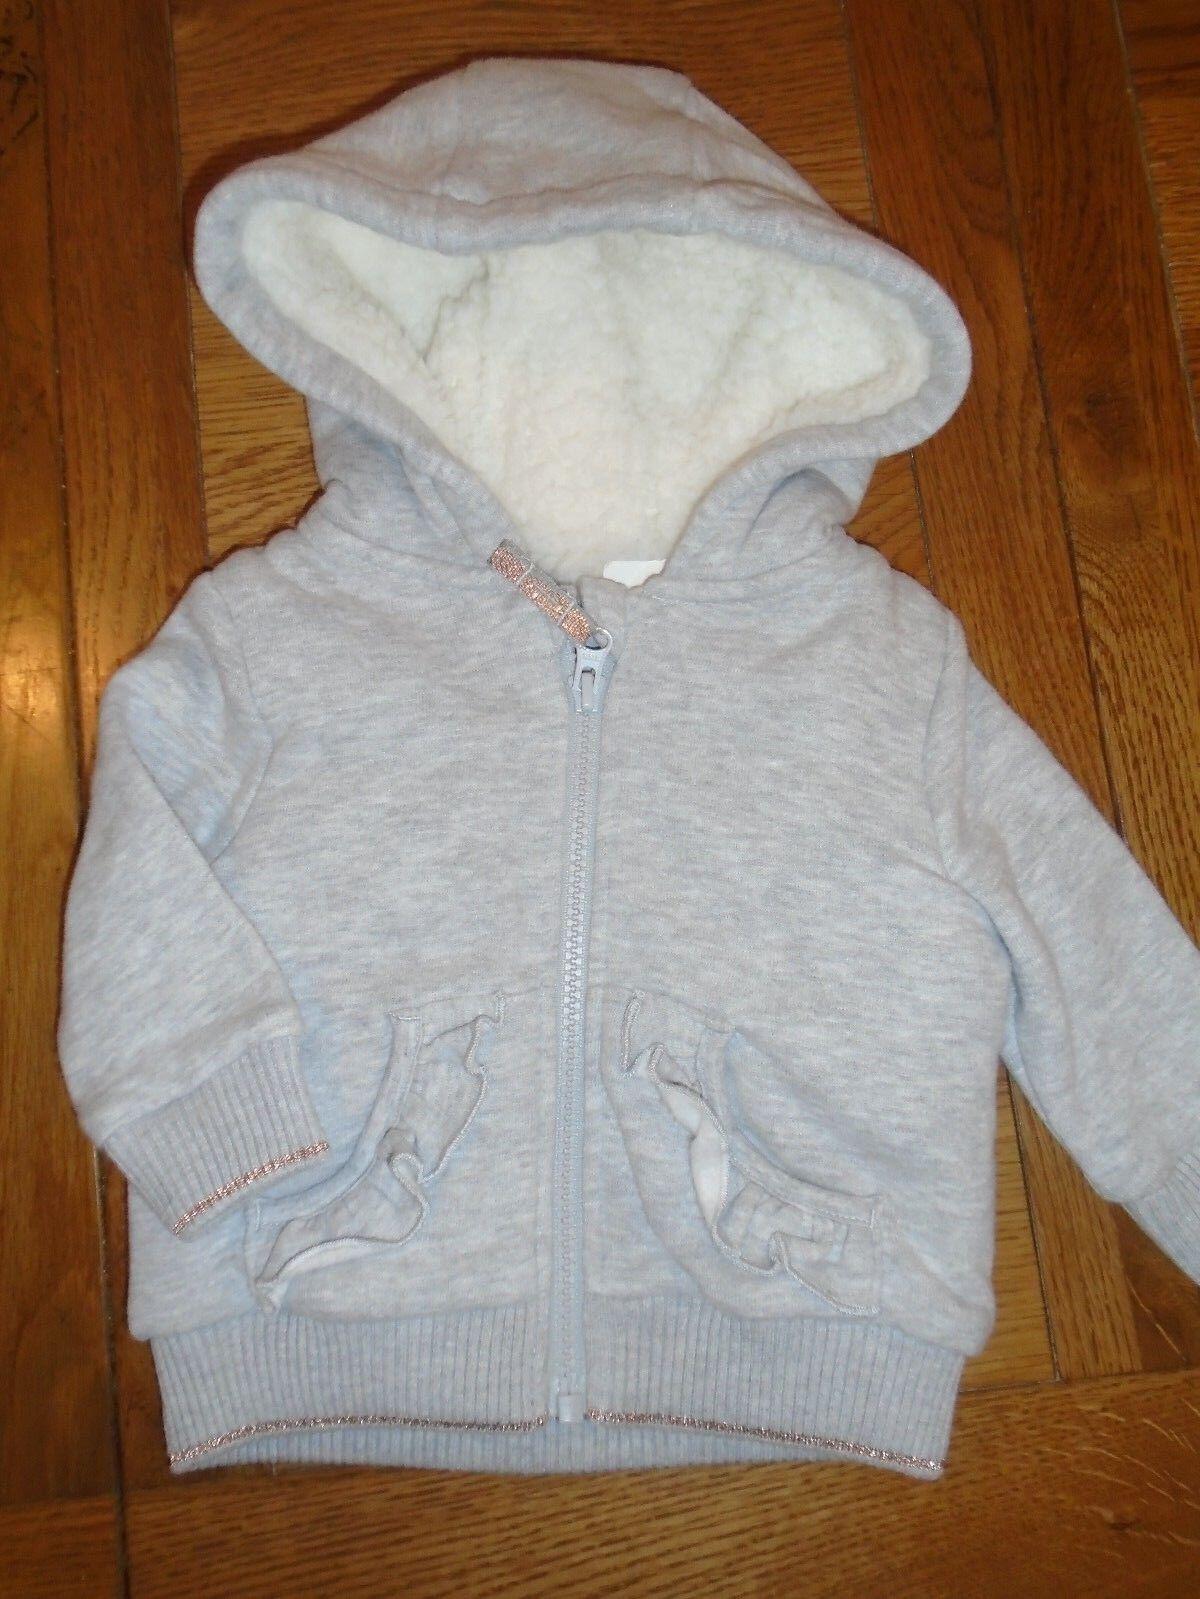 BNWT Baby Mädchen silbergrau Fleece gefütterte Kapuzenoberteil.M & amp; S.RRP 14,3-6 Monate (2/4)